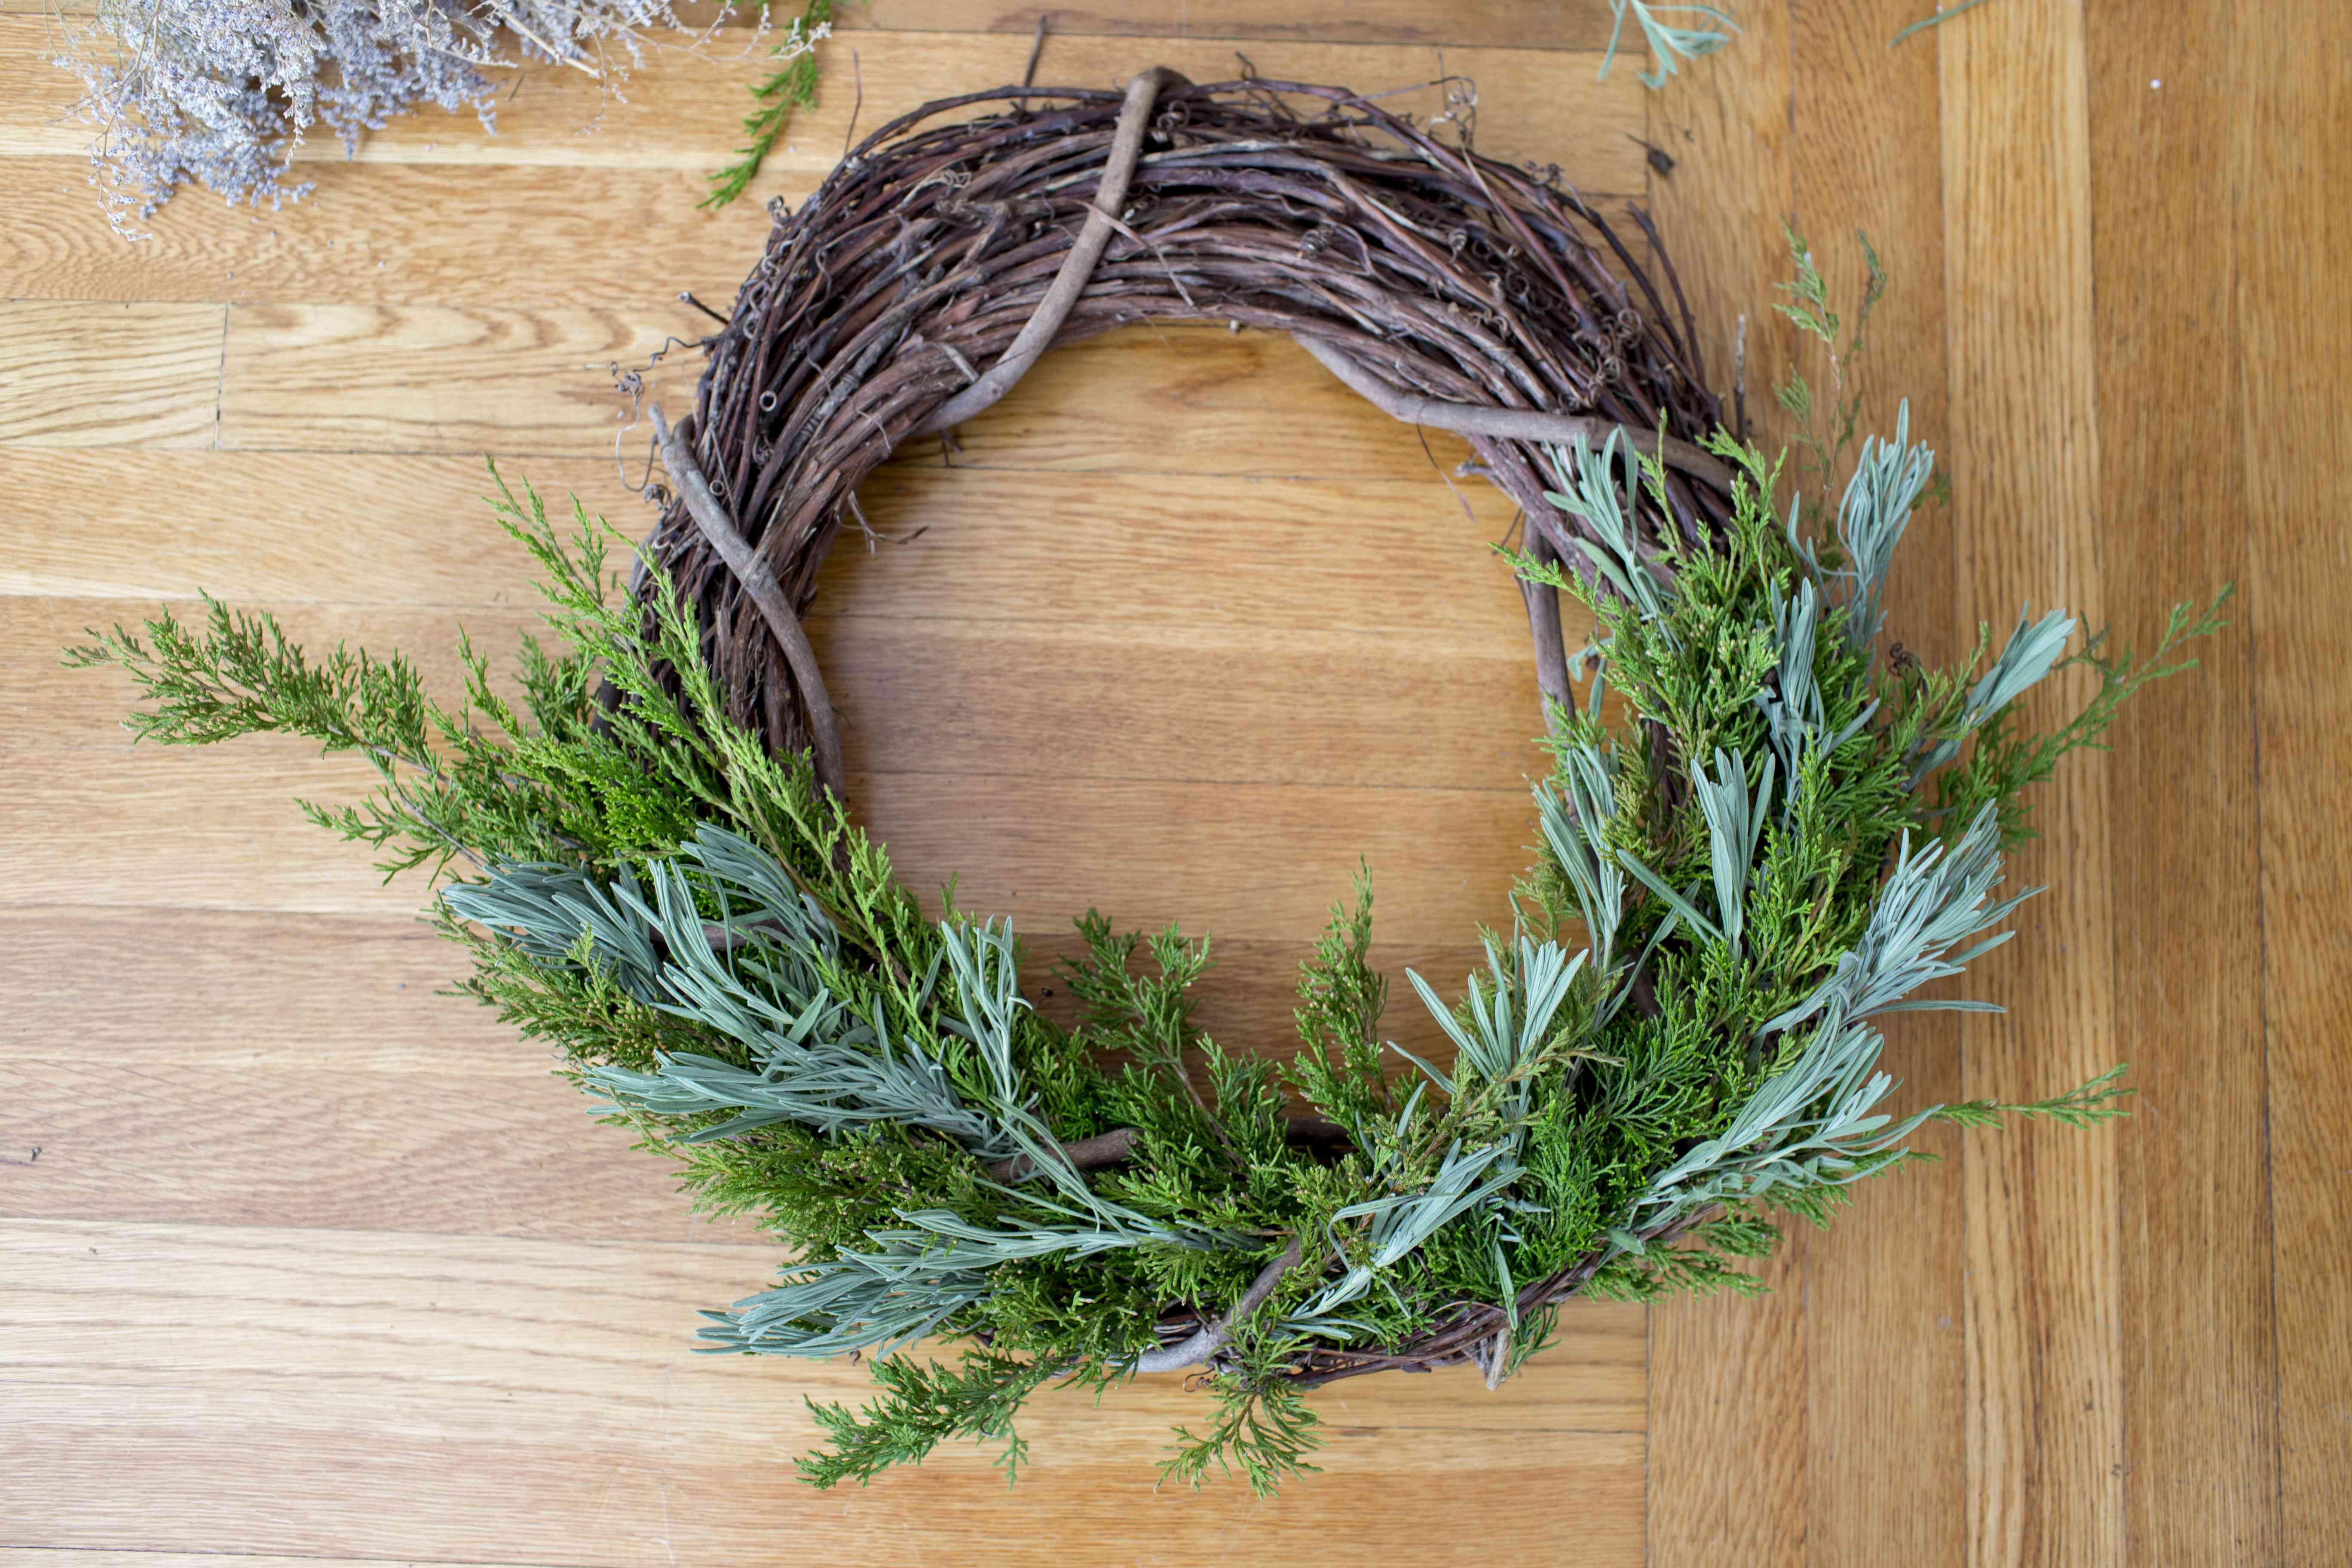 Add lavender to wreath